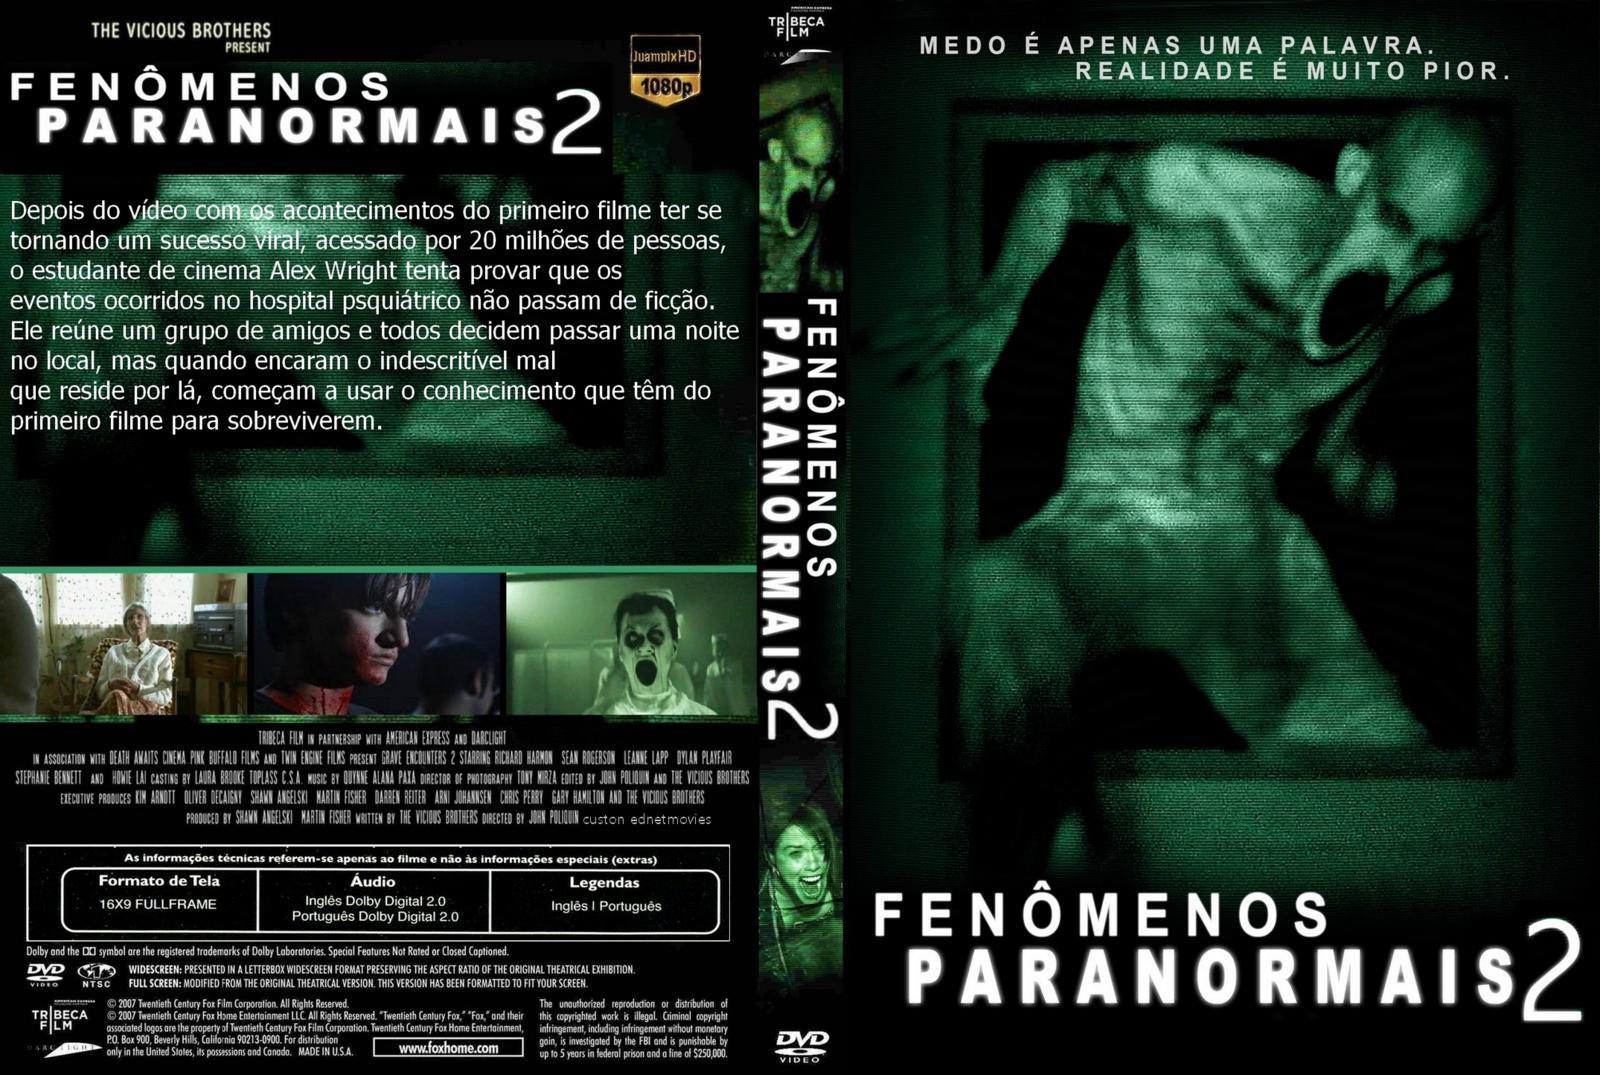 Fenômenos Paranormais 2 BDRip Dual Áudio capa dvd www